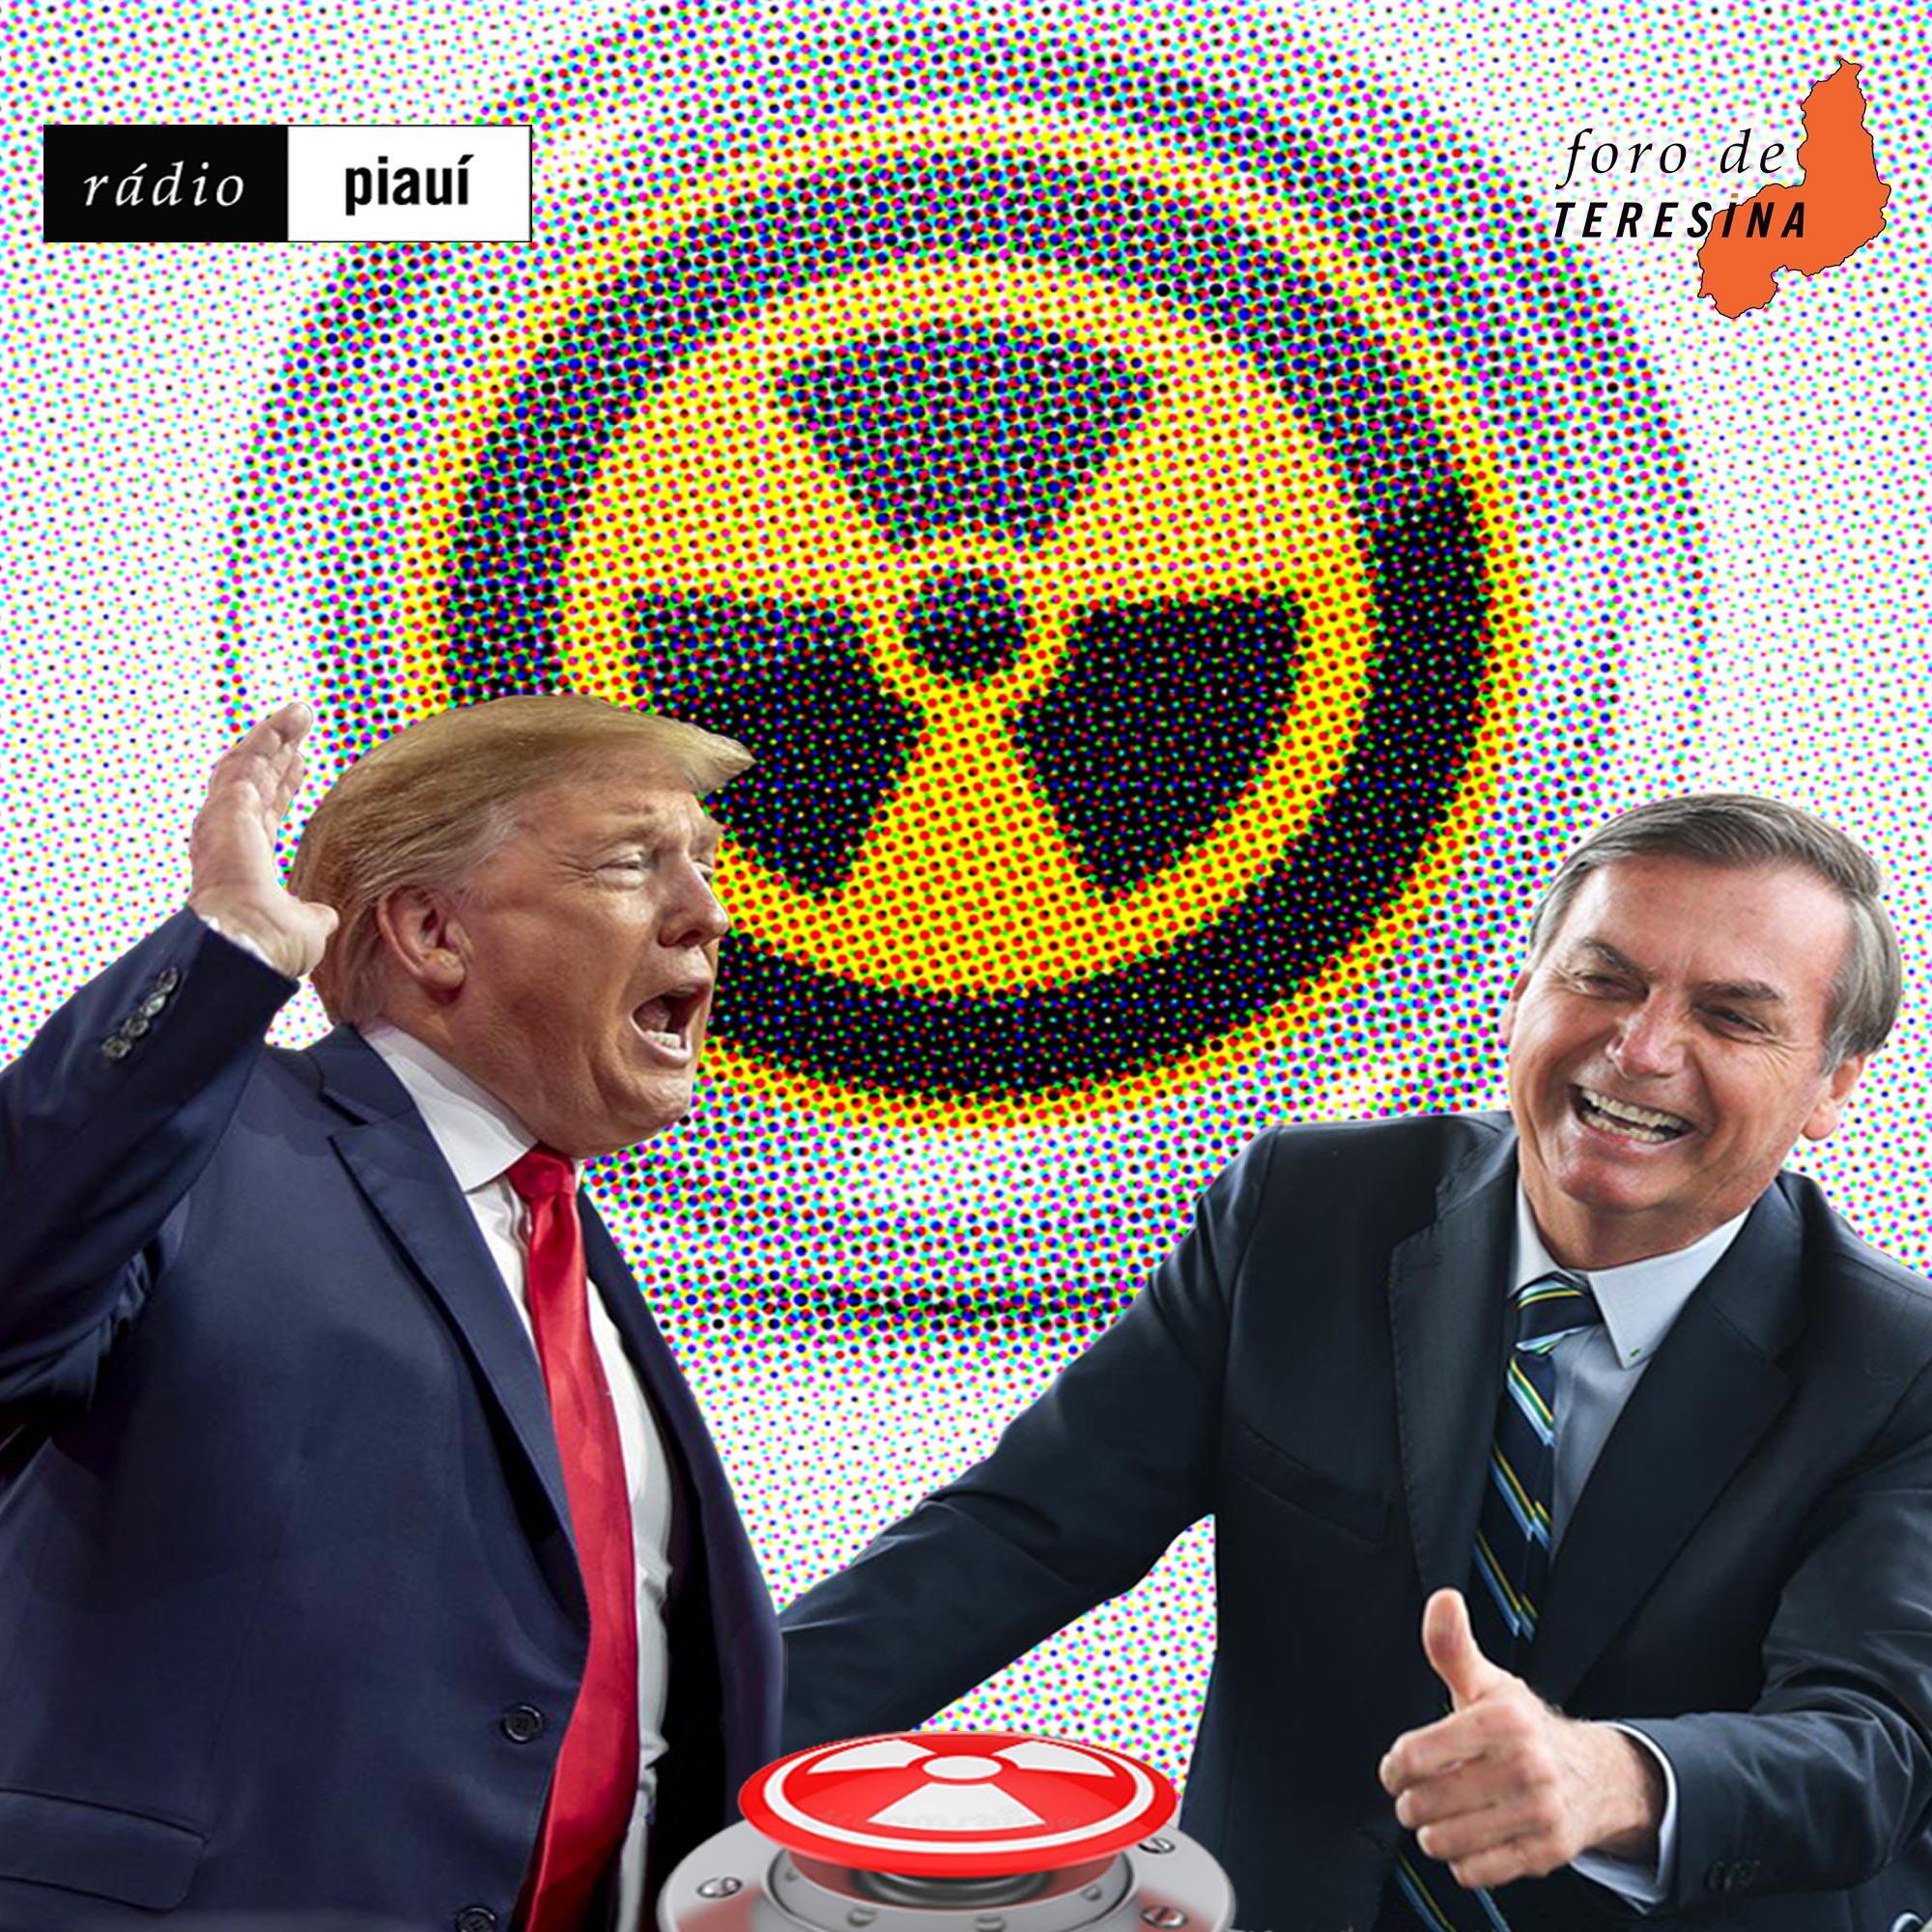 #83: EUA x Irã, Bolsonaro x Moro  e o atentado ao Porta dos Fundos